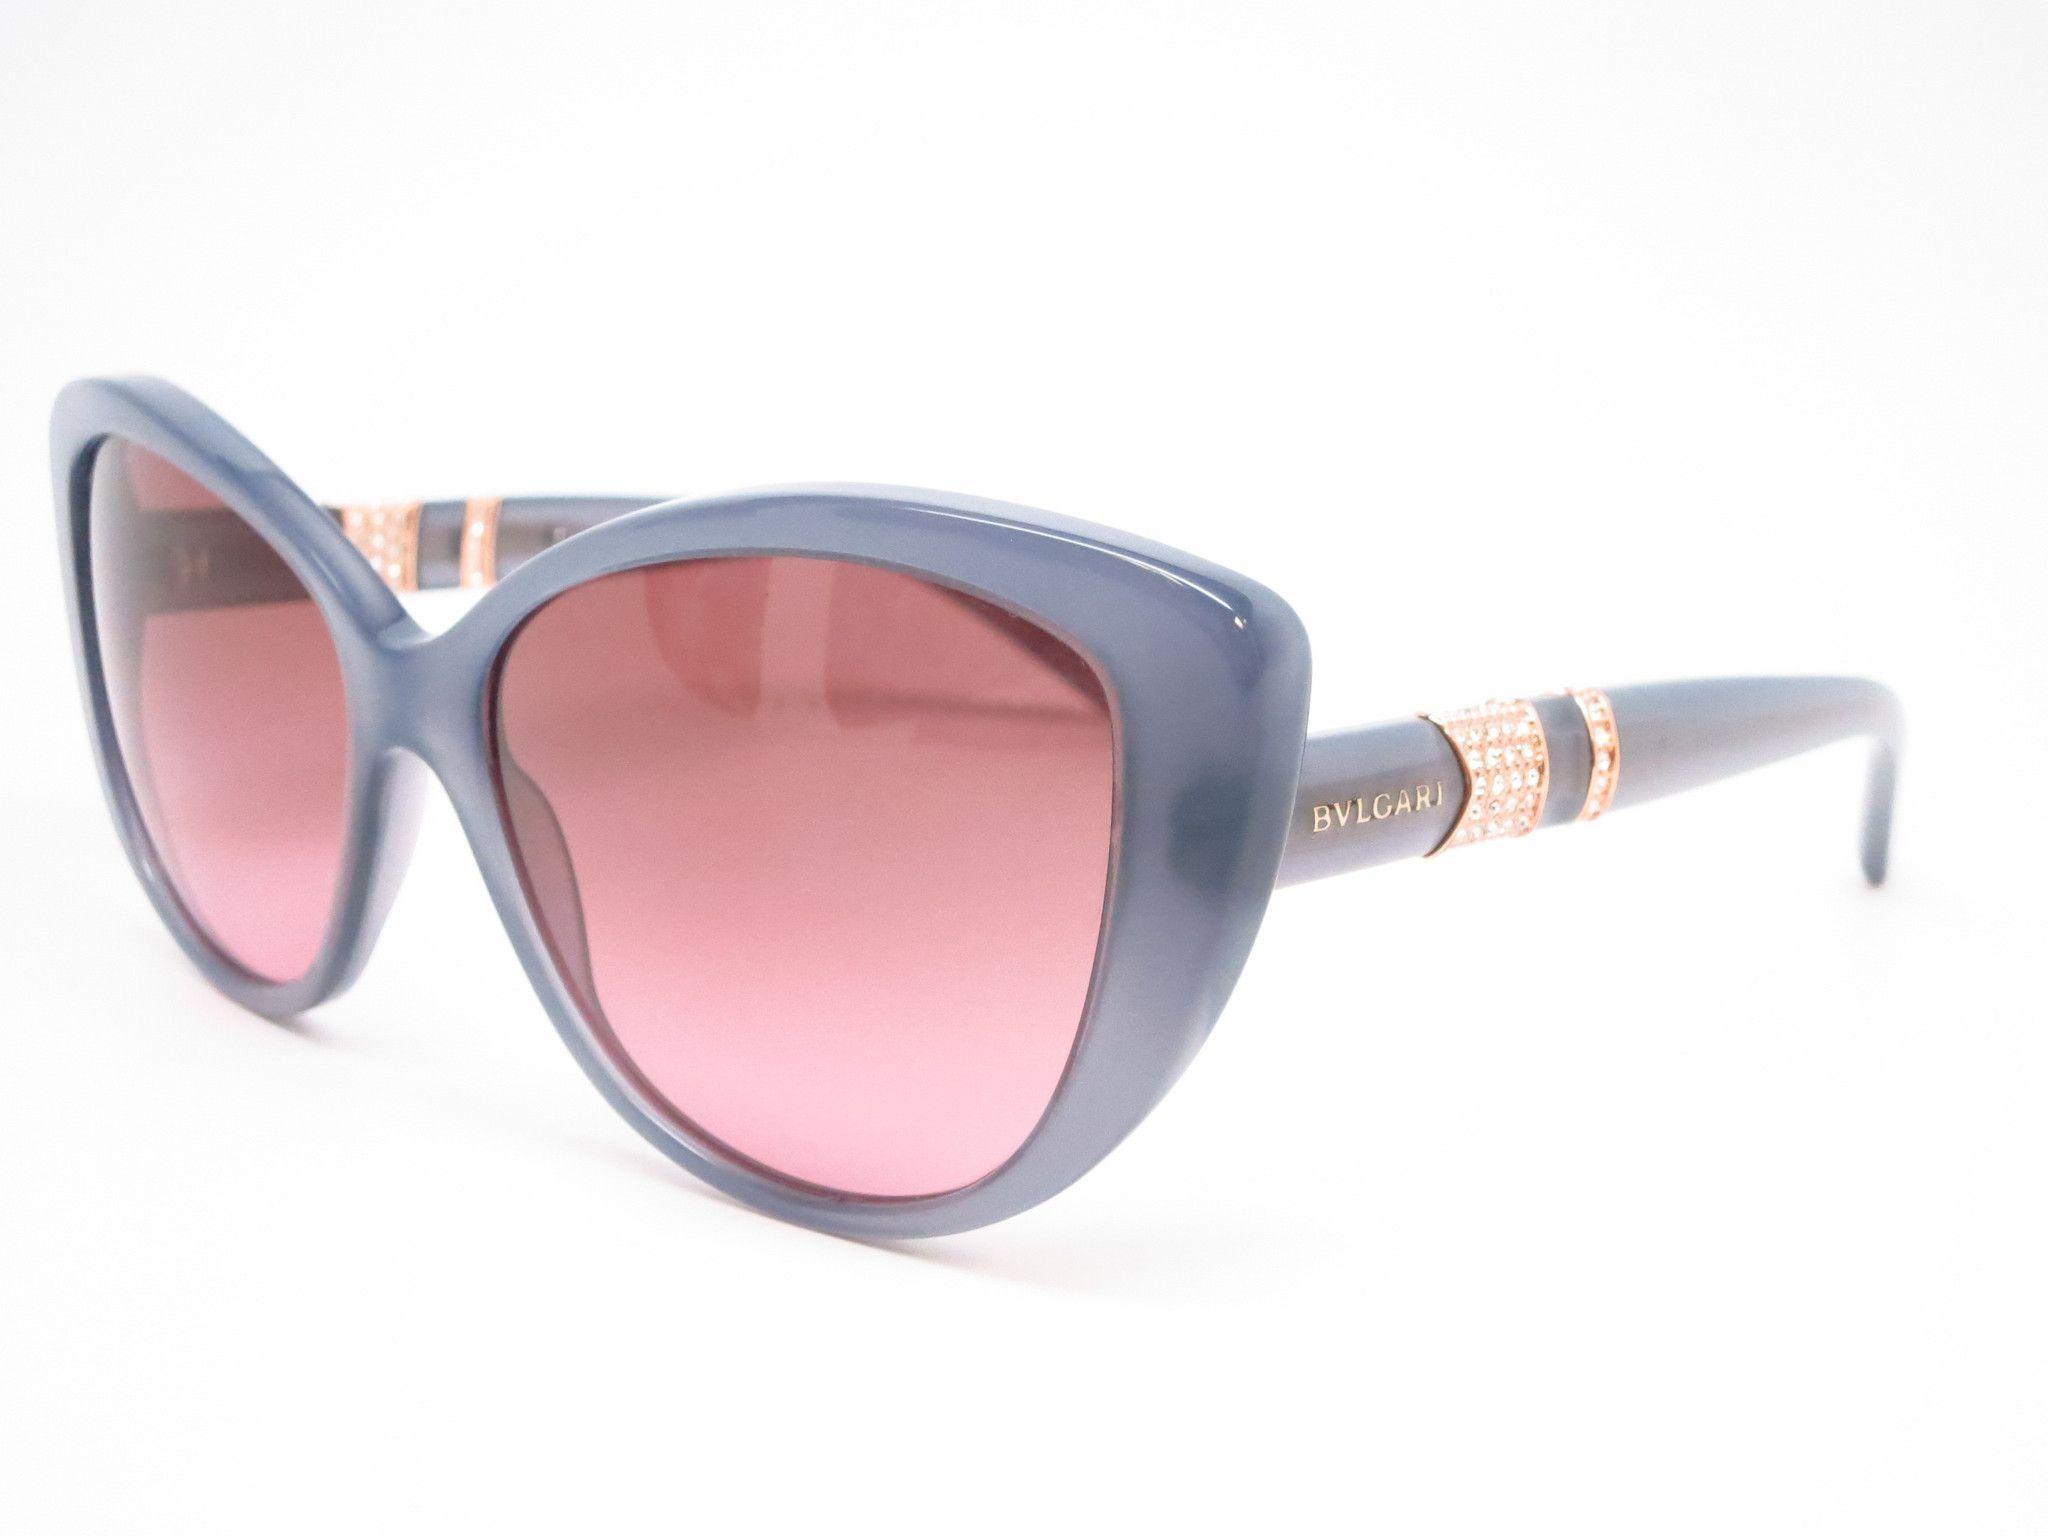 6a0615cbc4 Bvlgari BV 8151B 5321 14 Transparent Grey Sunglasses